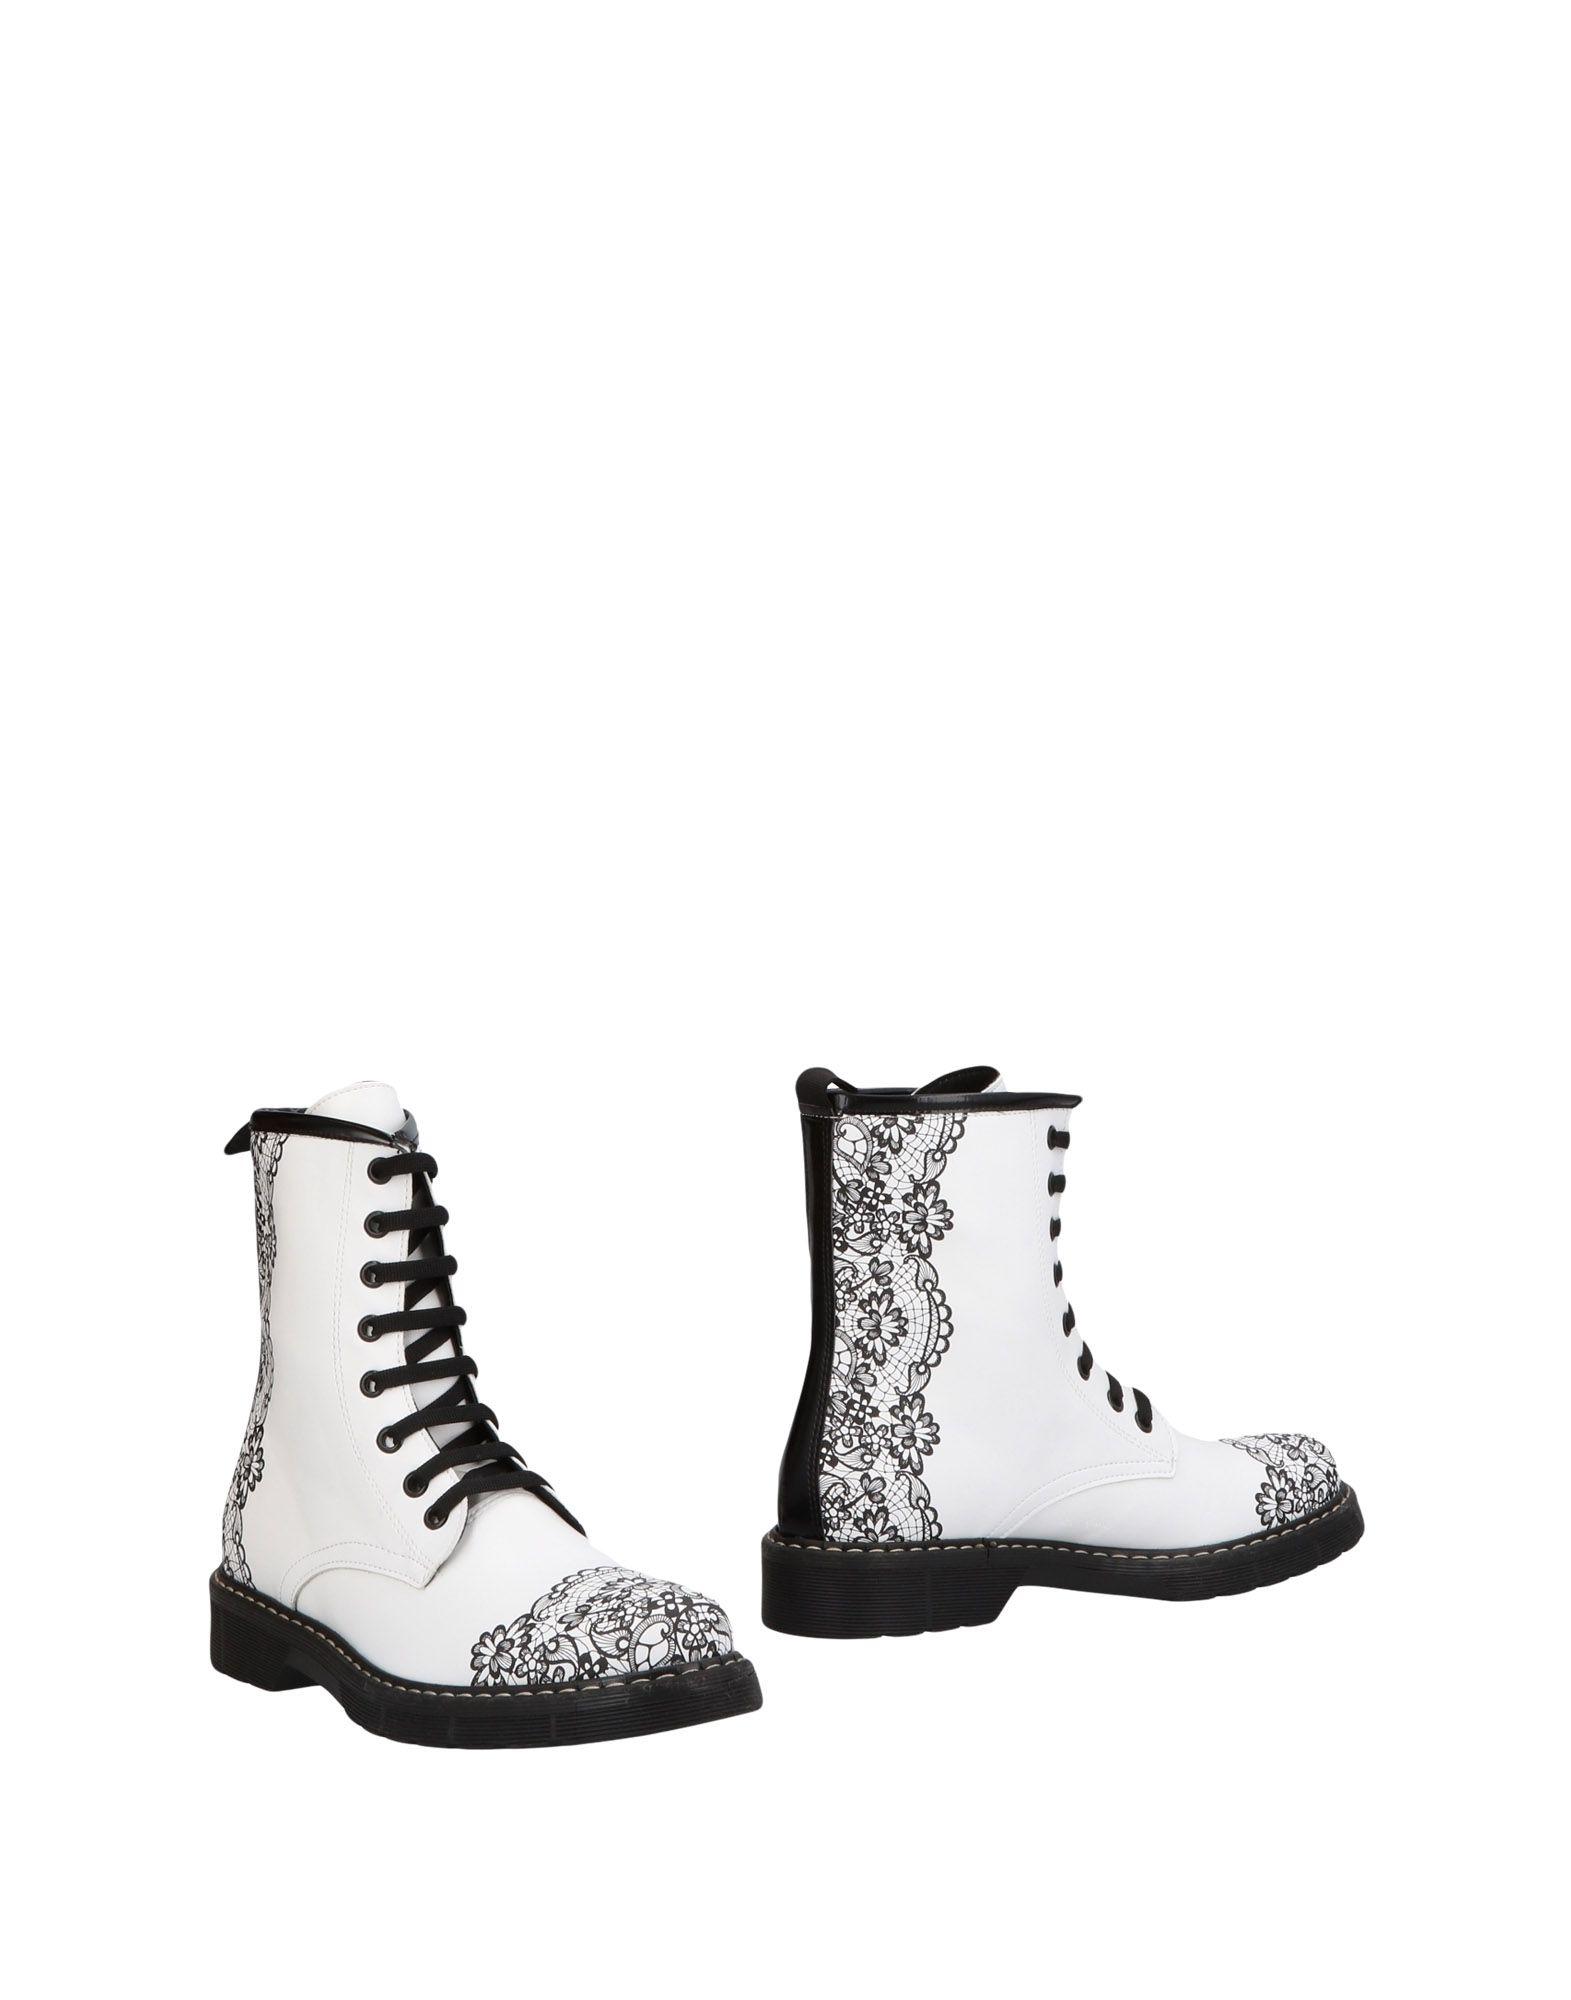 Nila & Nila Stiefelette beliebte Damen  11495149NT Gute Qualität beliebte Stiefelette Schuhe 828b5c